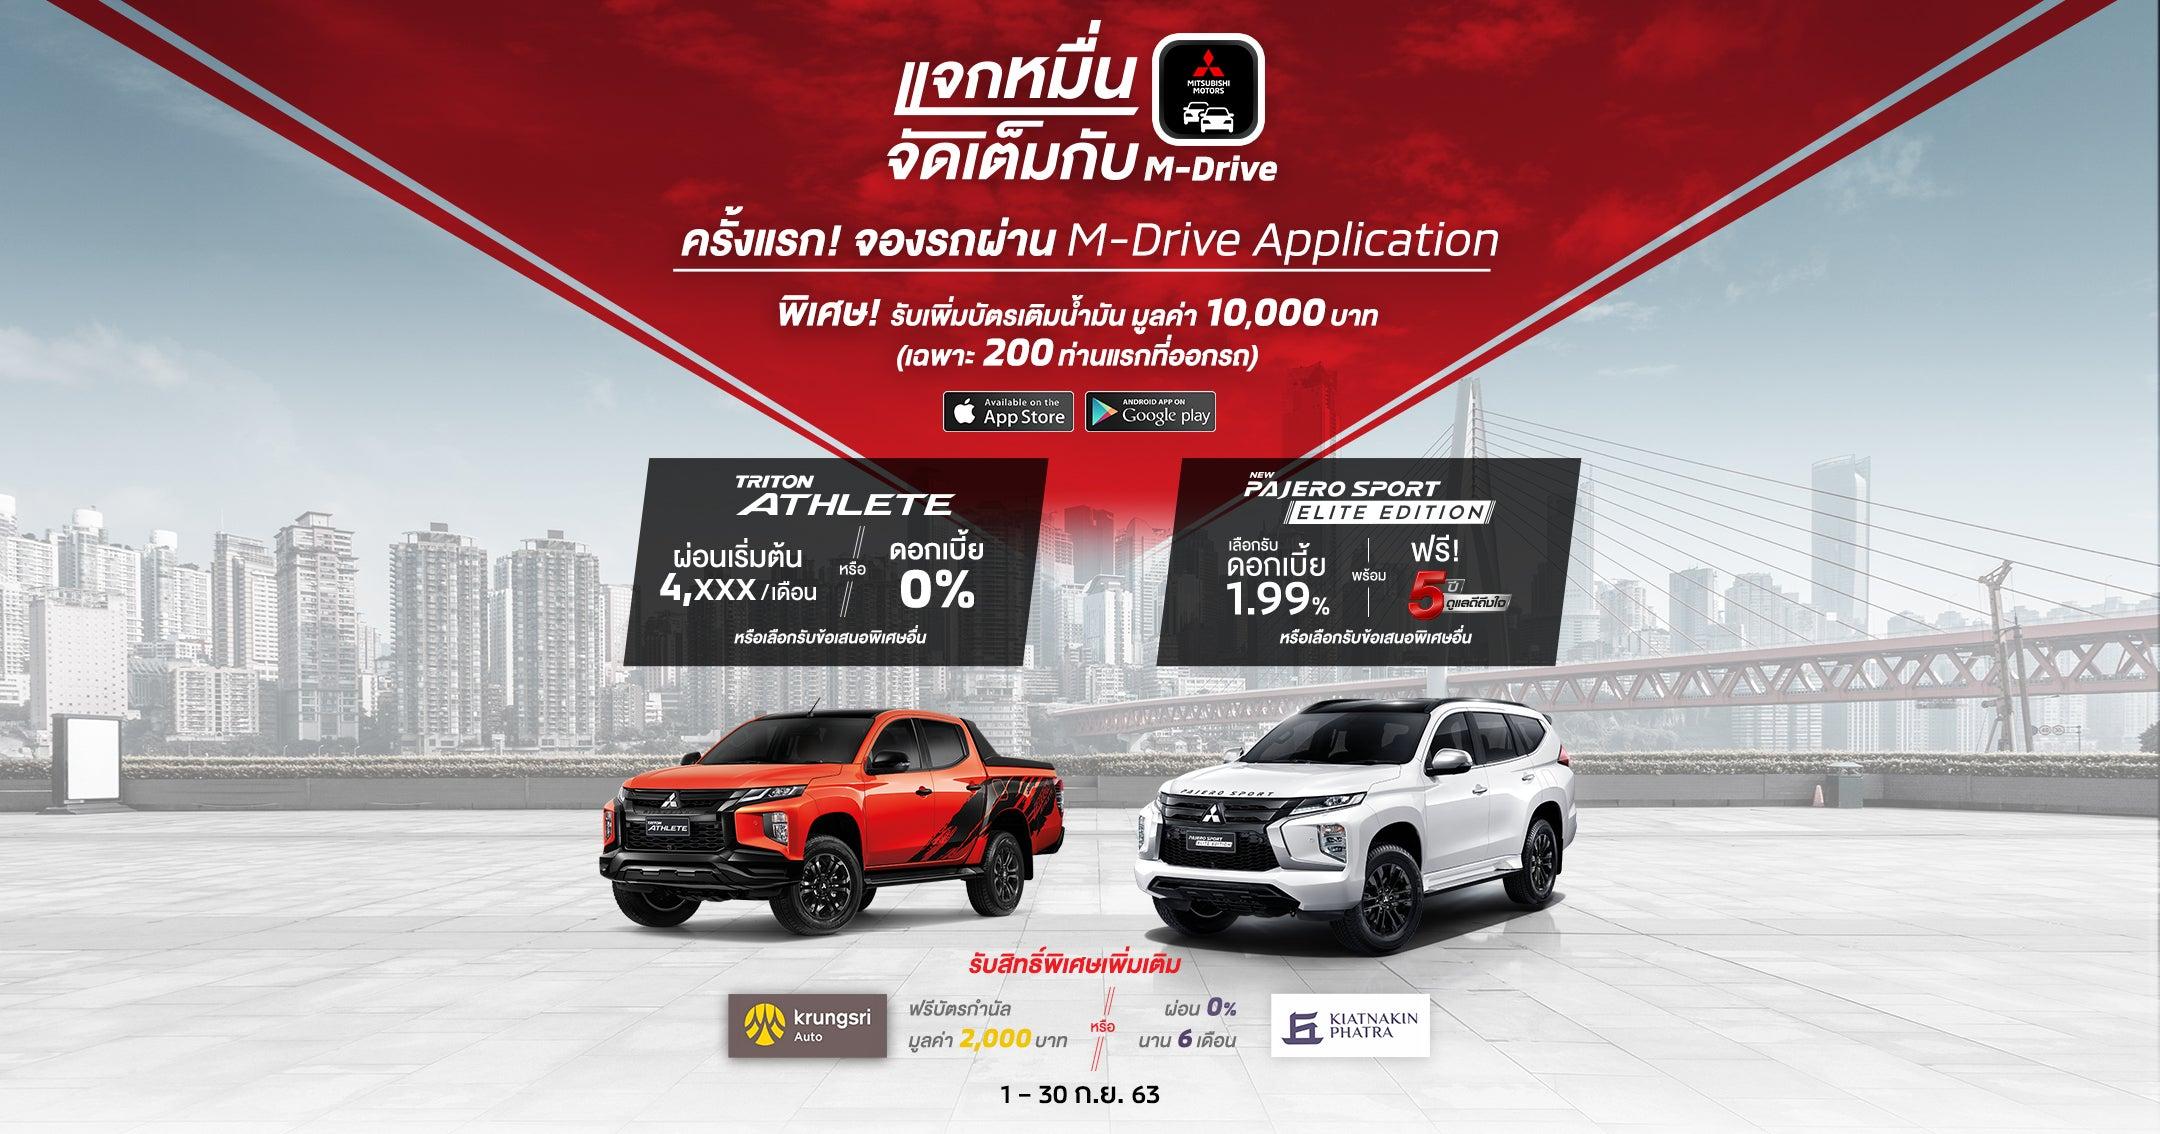 https://www.mitsubishi-motors.co.th/content/dam/mitsubishi-motors-th/images/site-images/offers/promotion/september-2020/m-drive-promotion/Mitsubishi_MDrive_Aug20_Web_banner_1200x630.jpg?width=2160&auto=webp